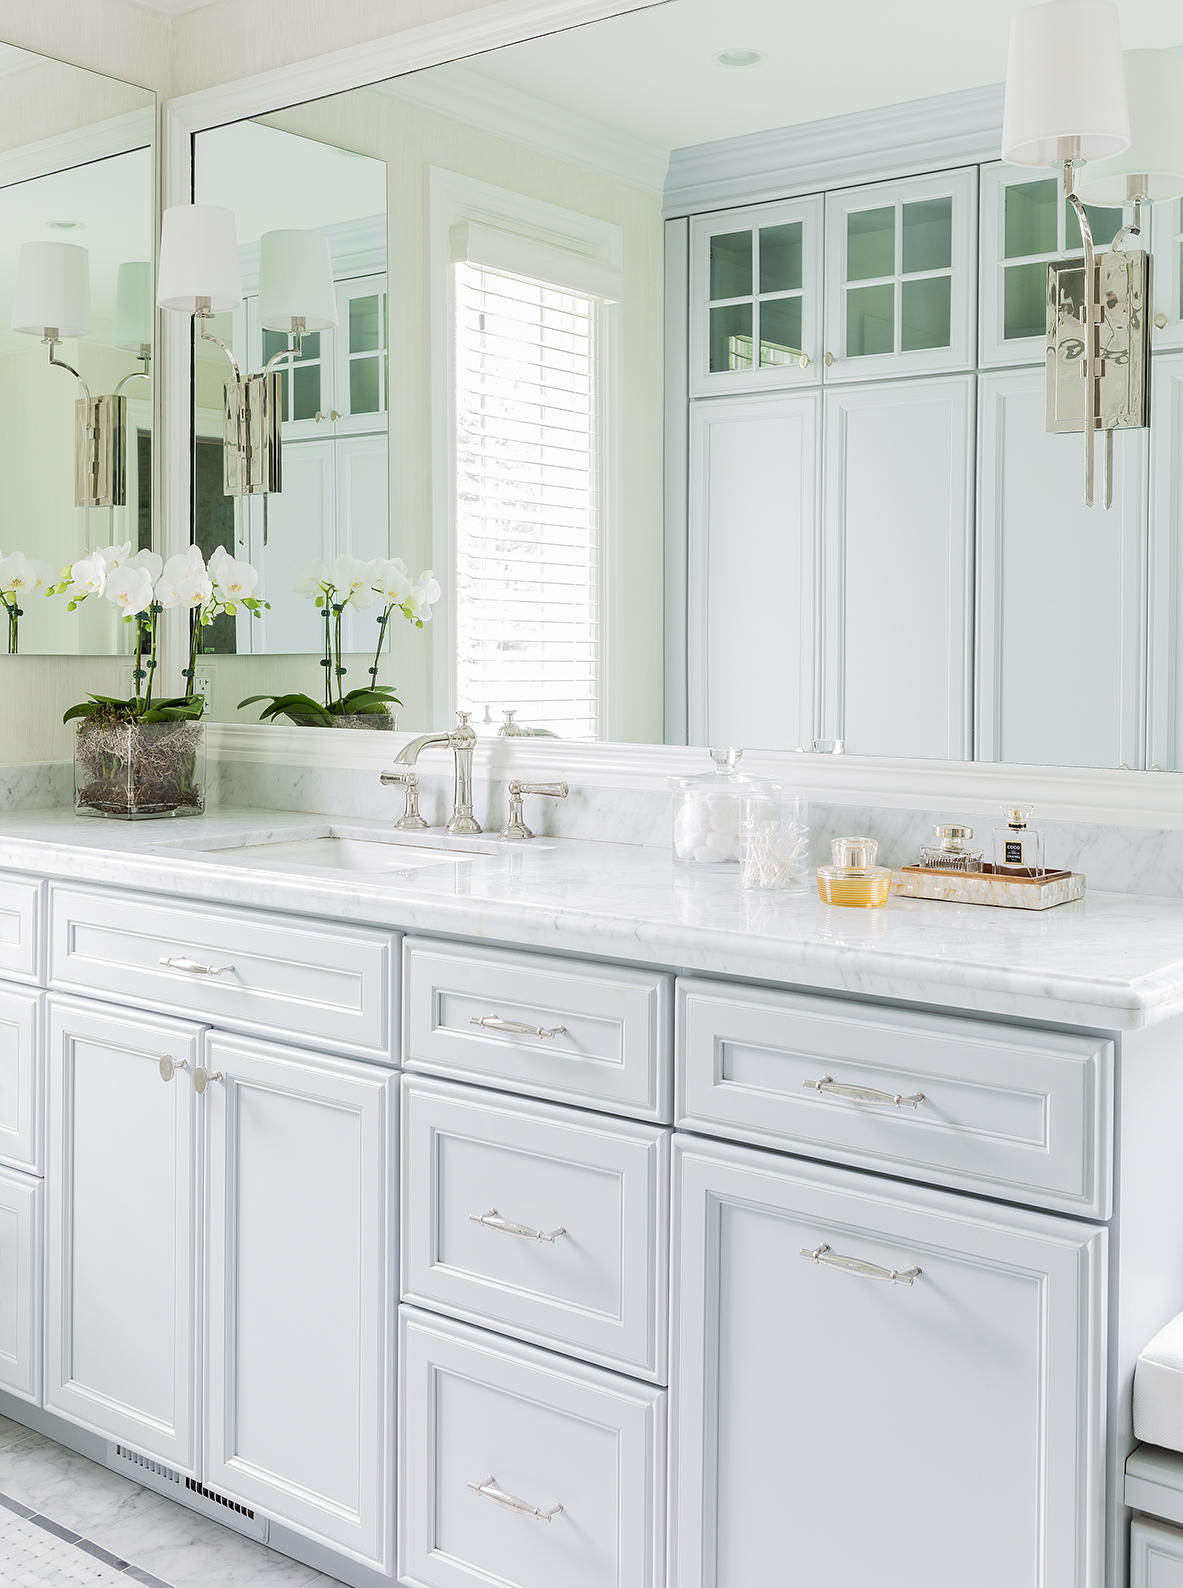 KitchenVisions_Allen_Dedham_MA__K8B0173.jpg